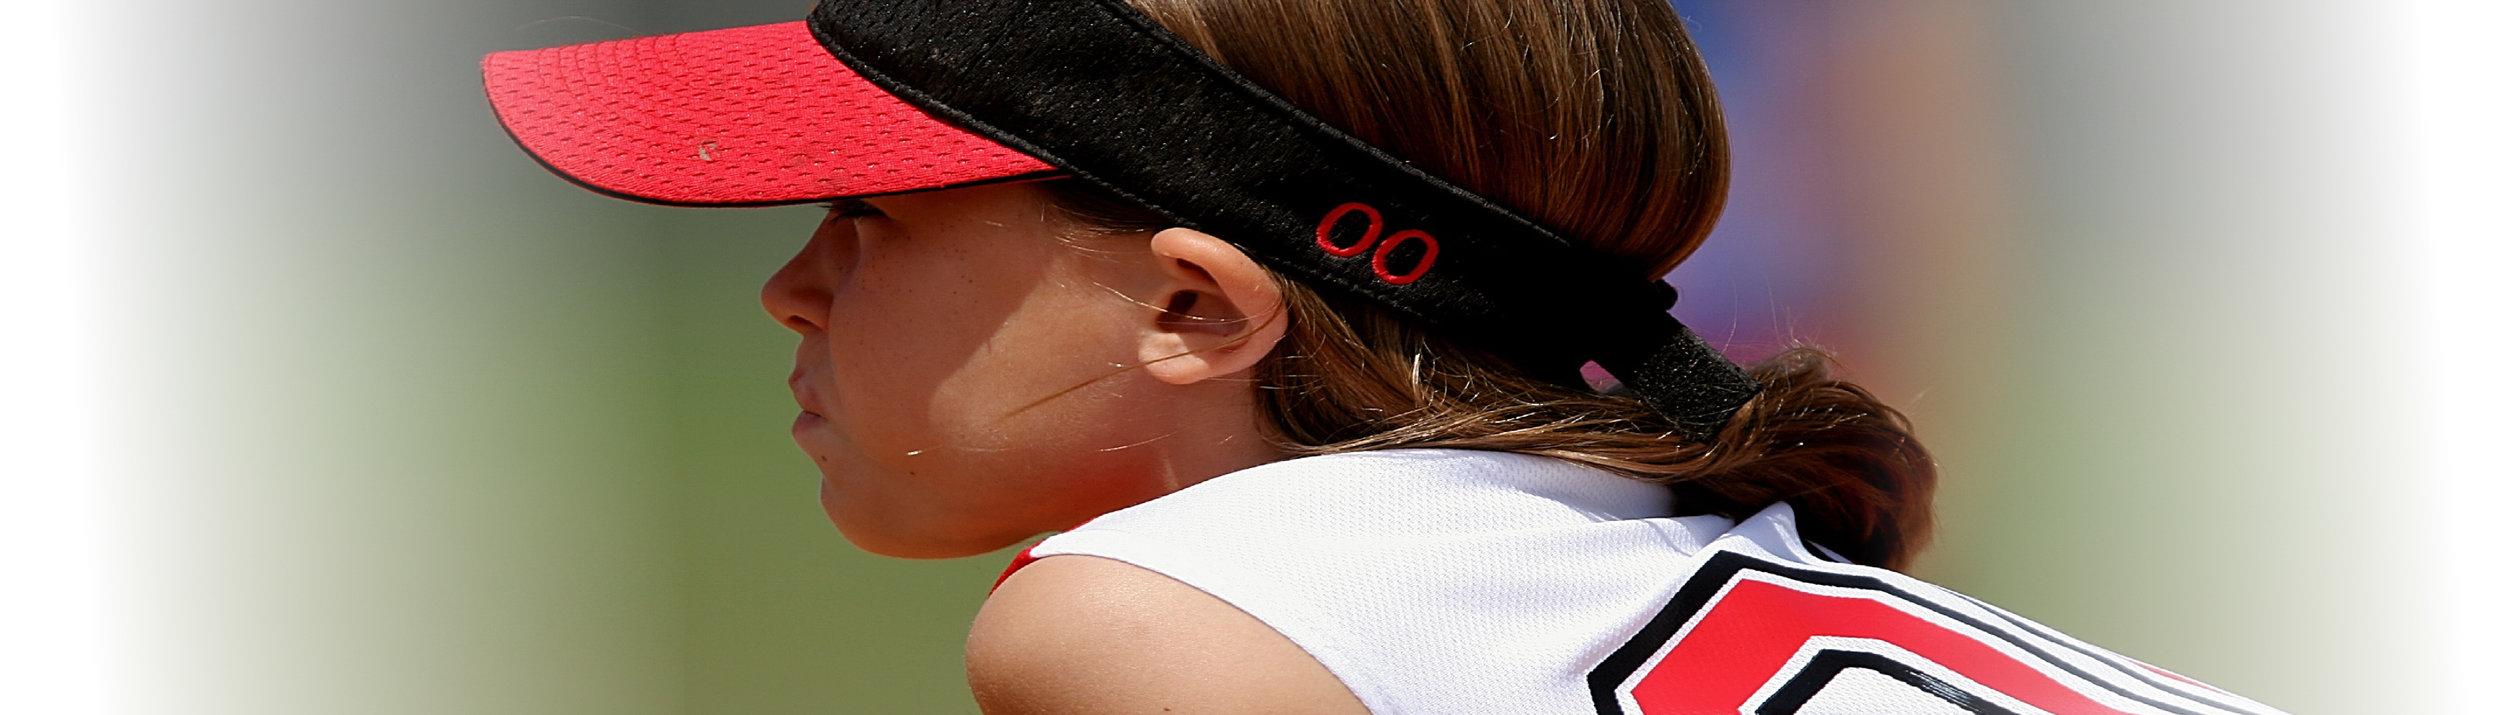 Home Page Pic Softball2.JPG